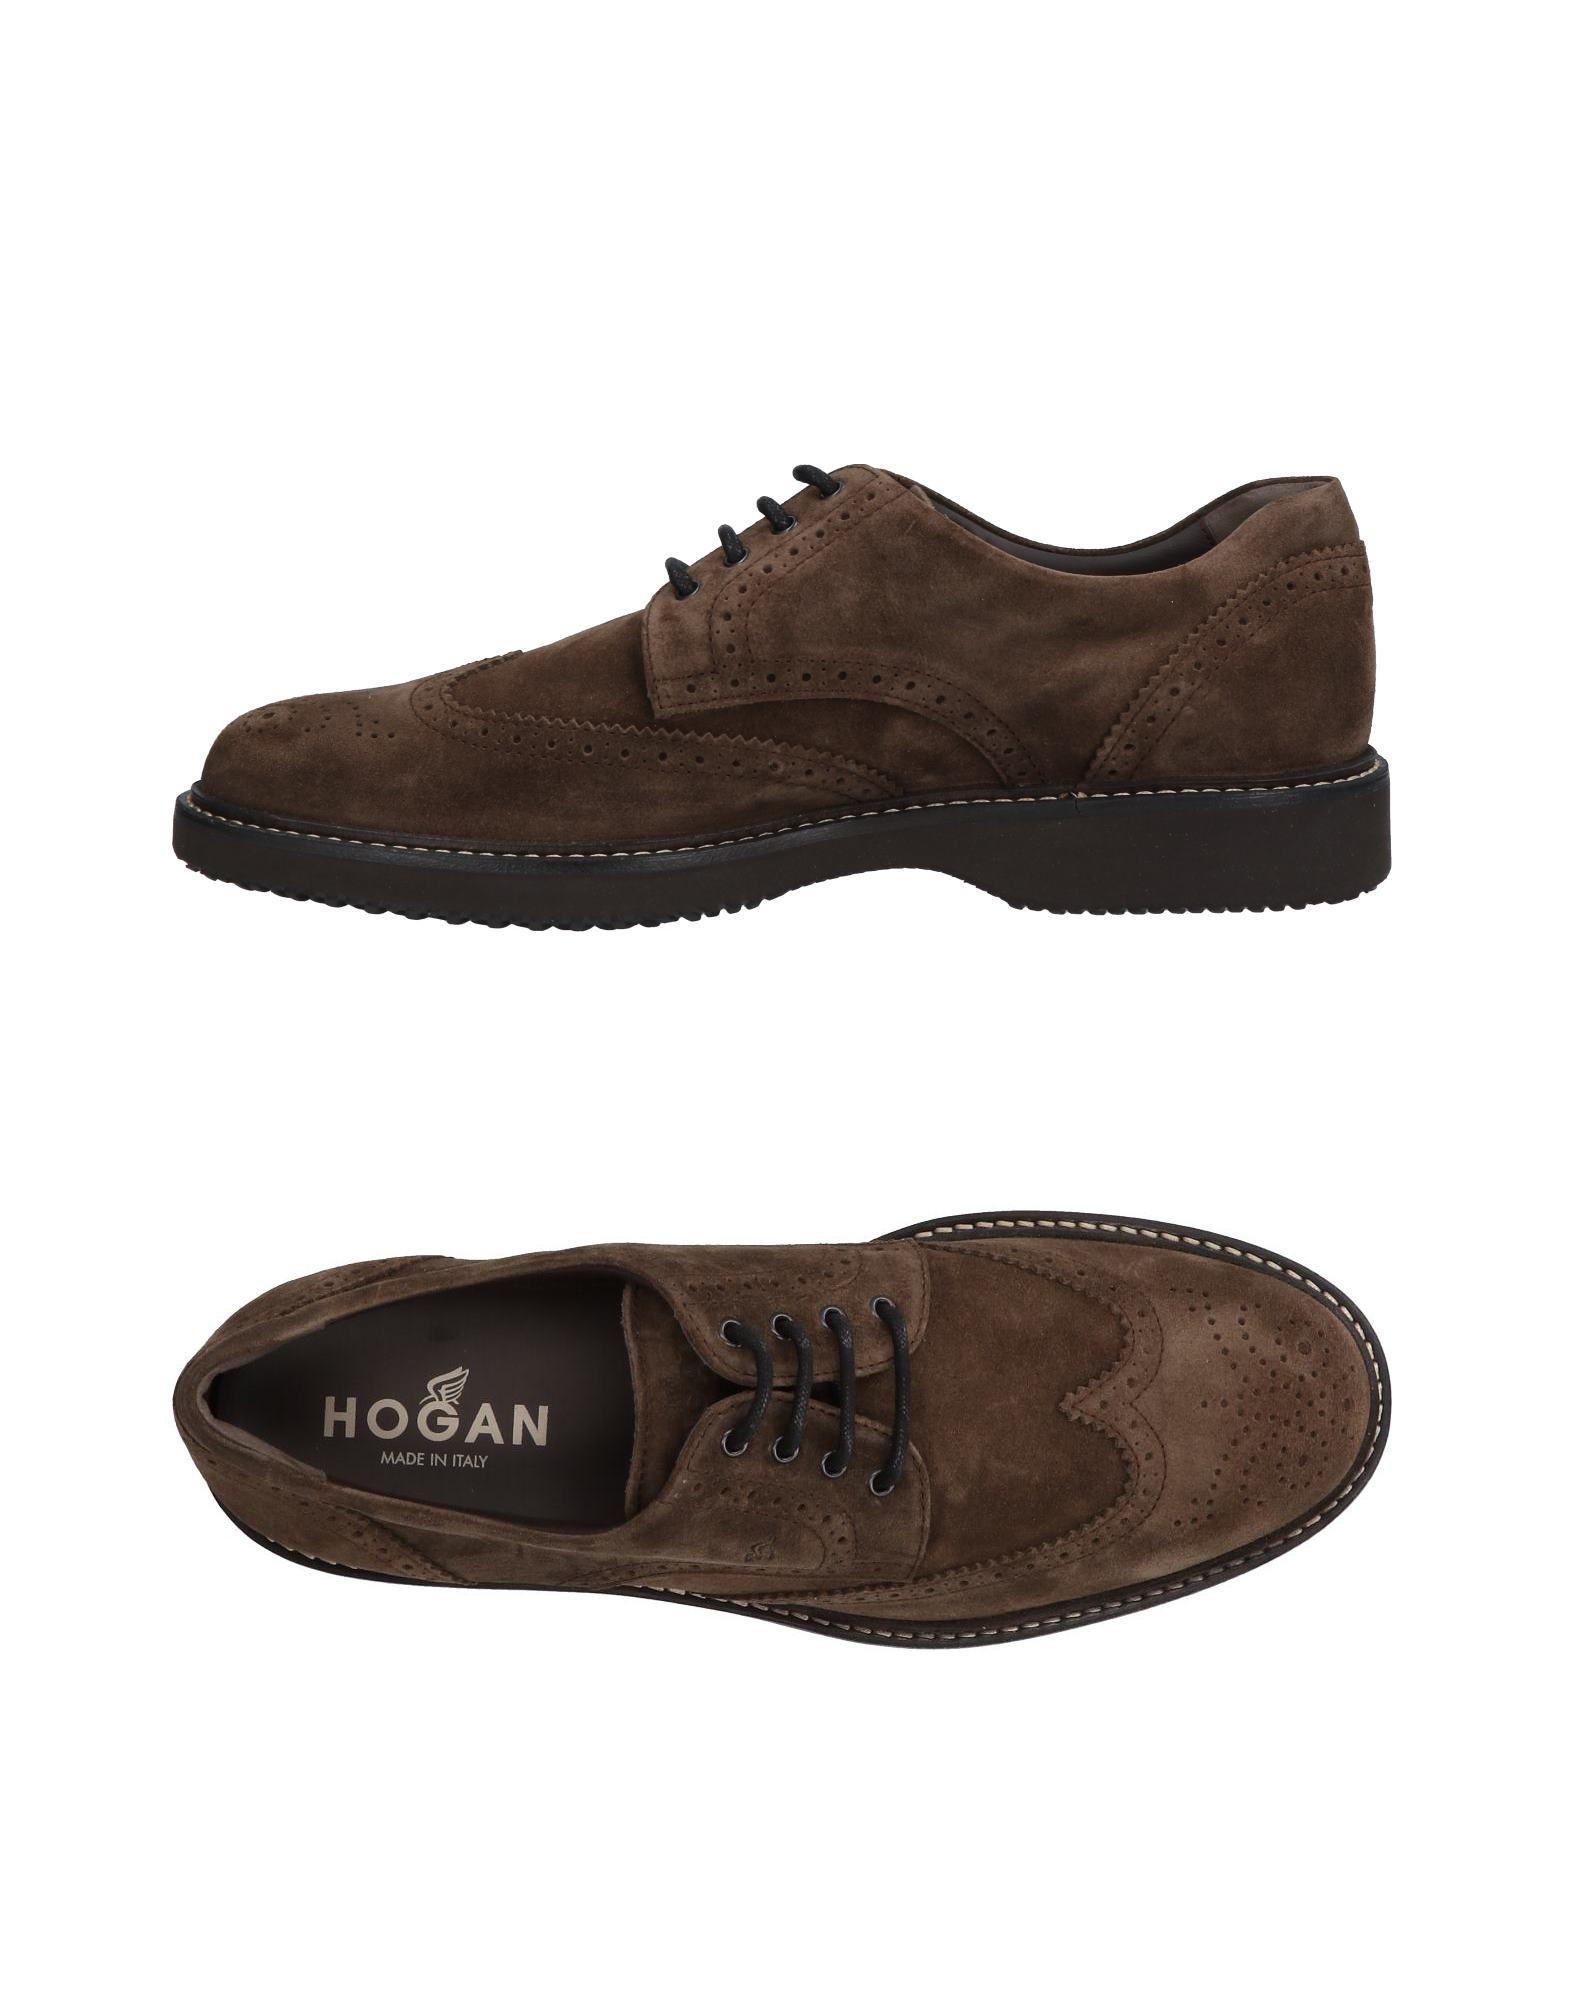 Moda 11486310KF Stringate Hogan Uomo - 11486310KF Moda 2d8656